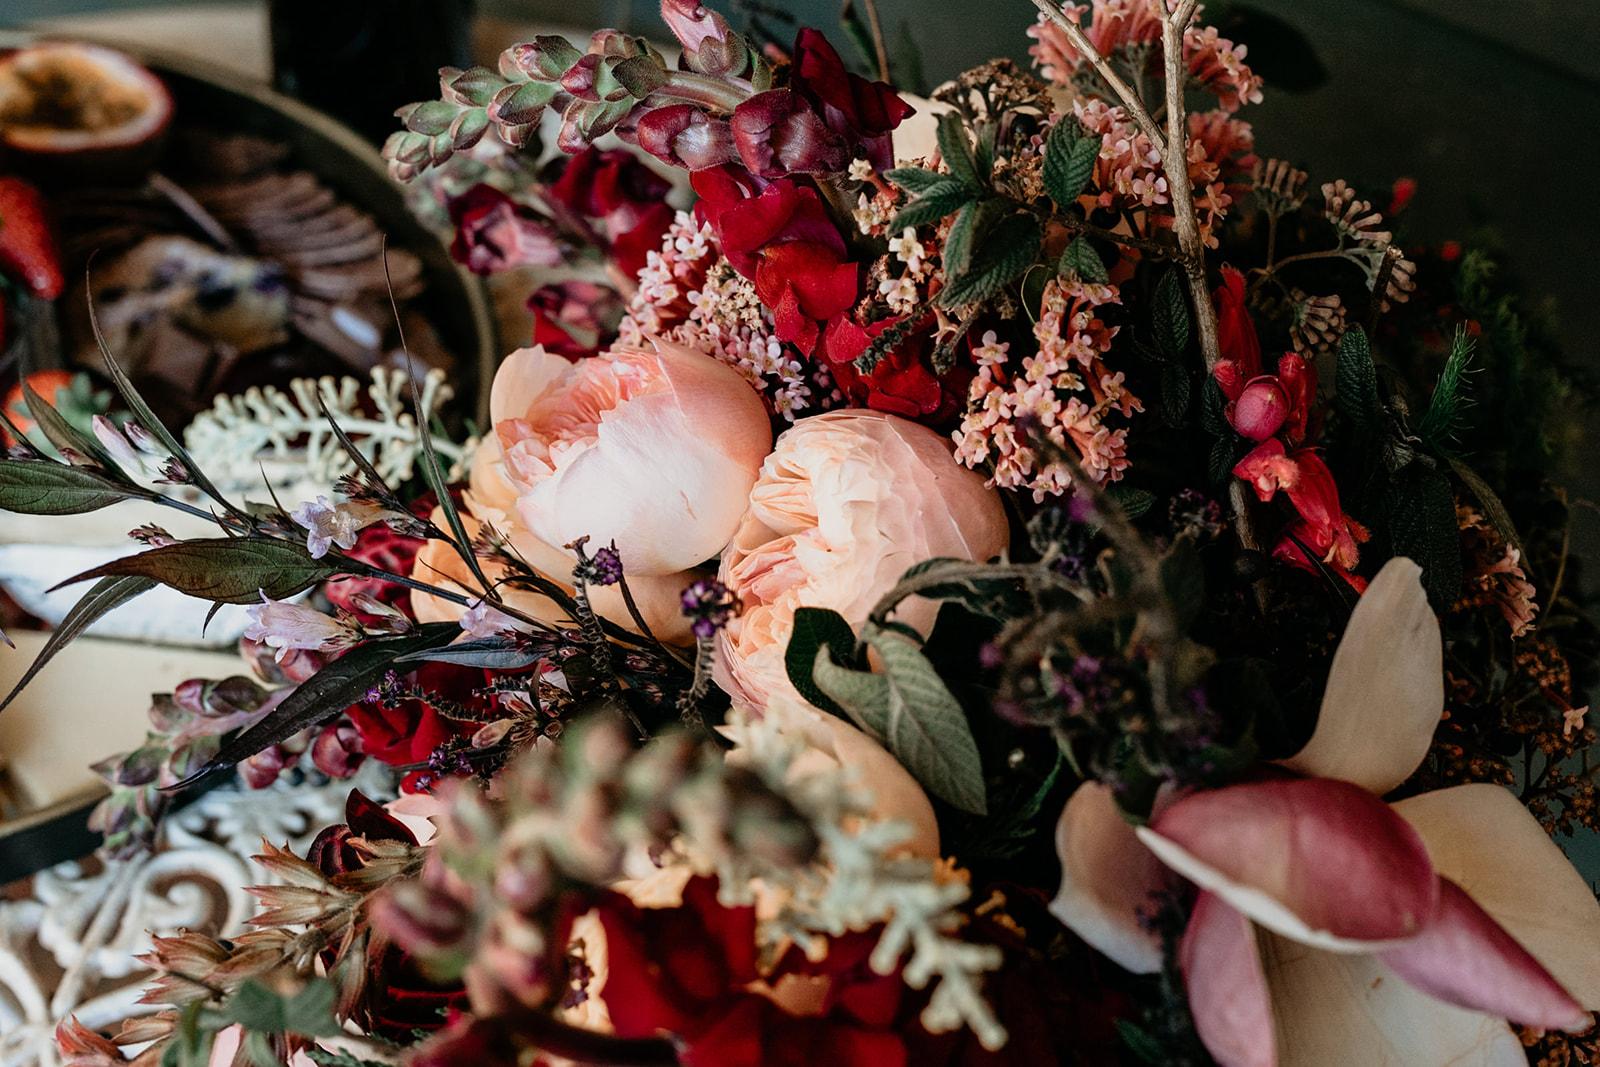 bridal-designer-gold-coast-brisbane-helena-couture-designs03.jpg